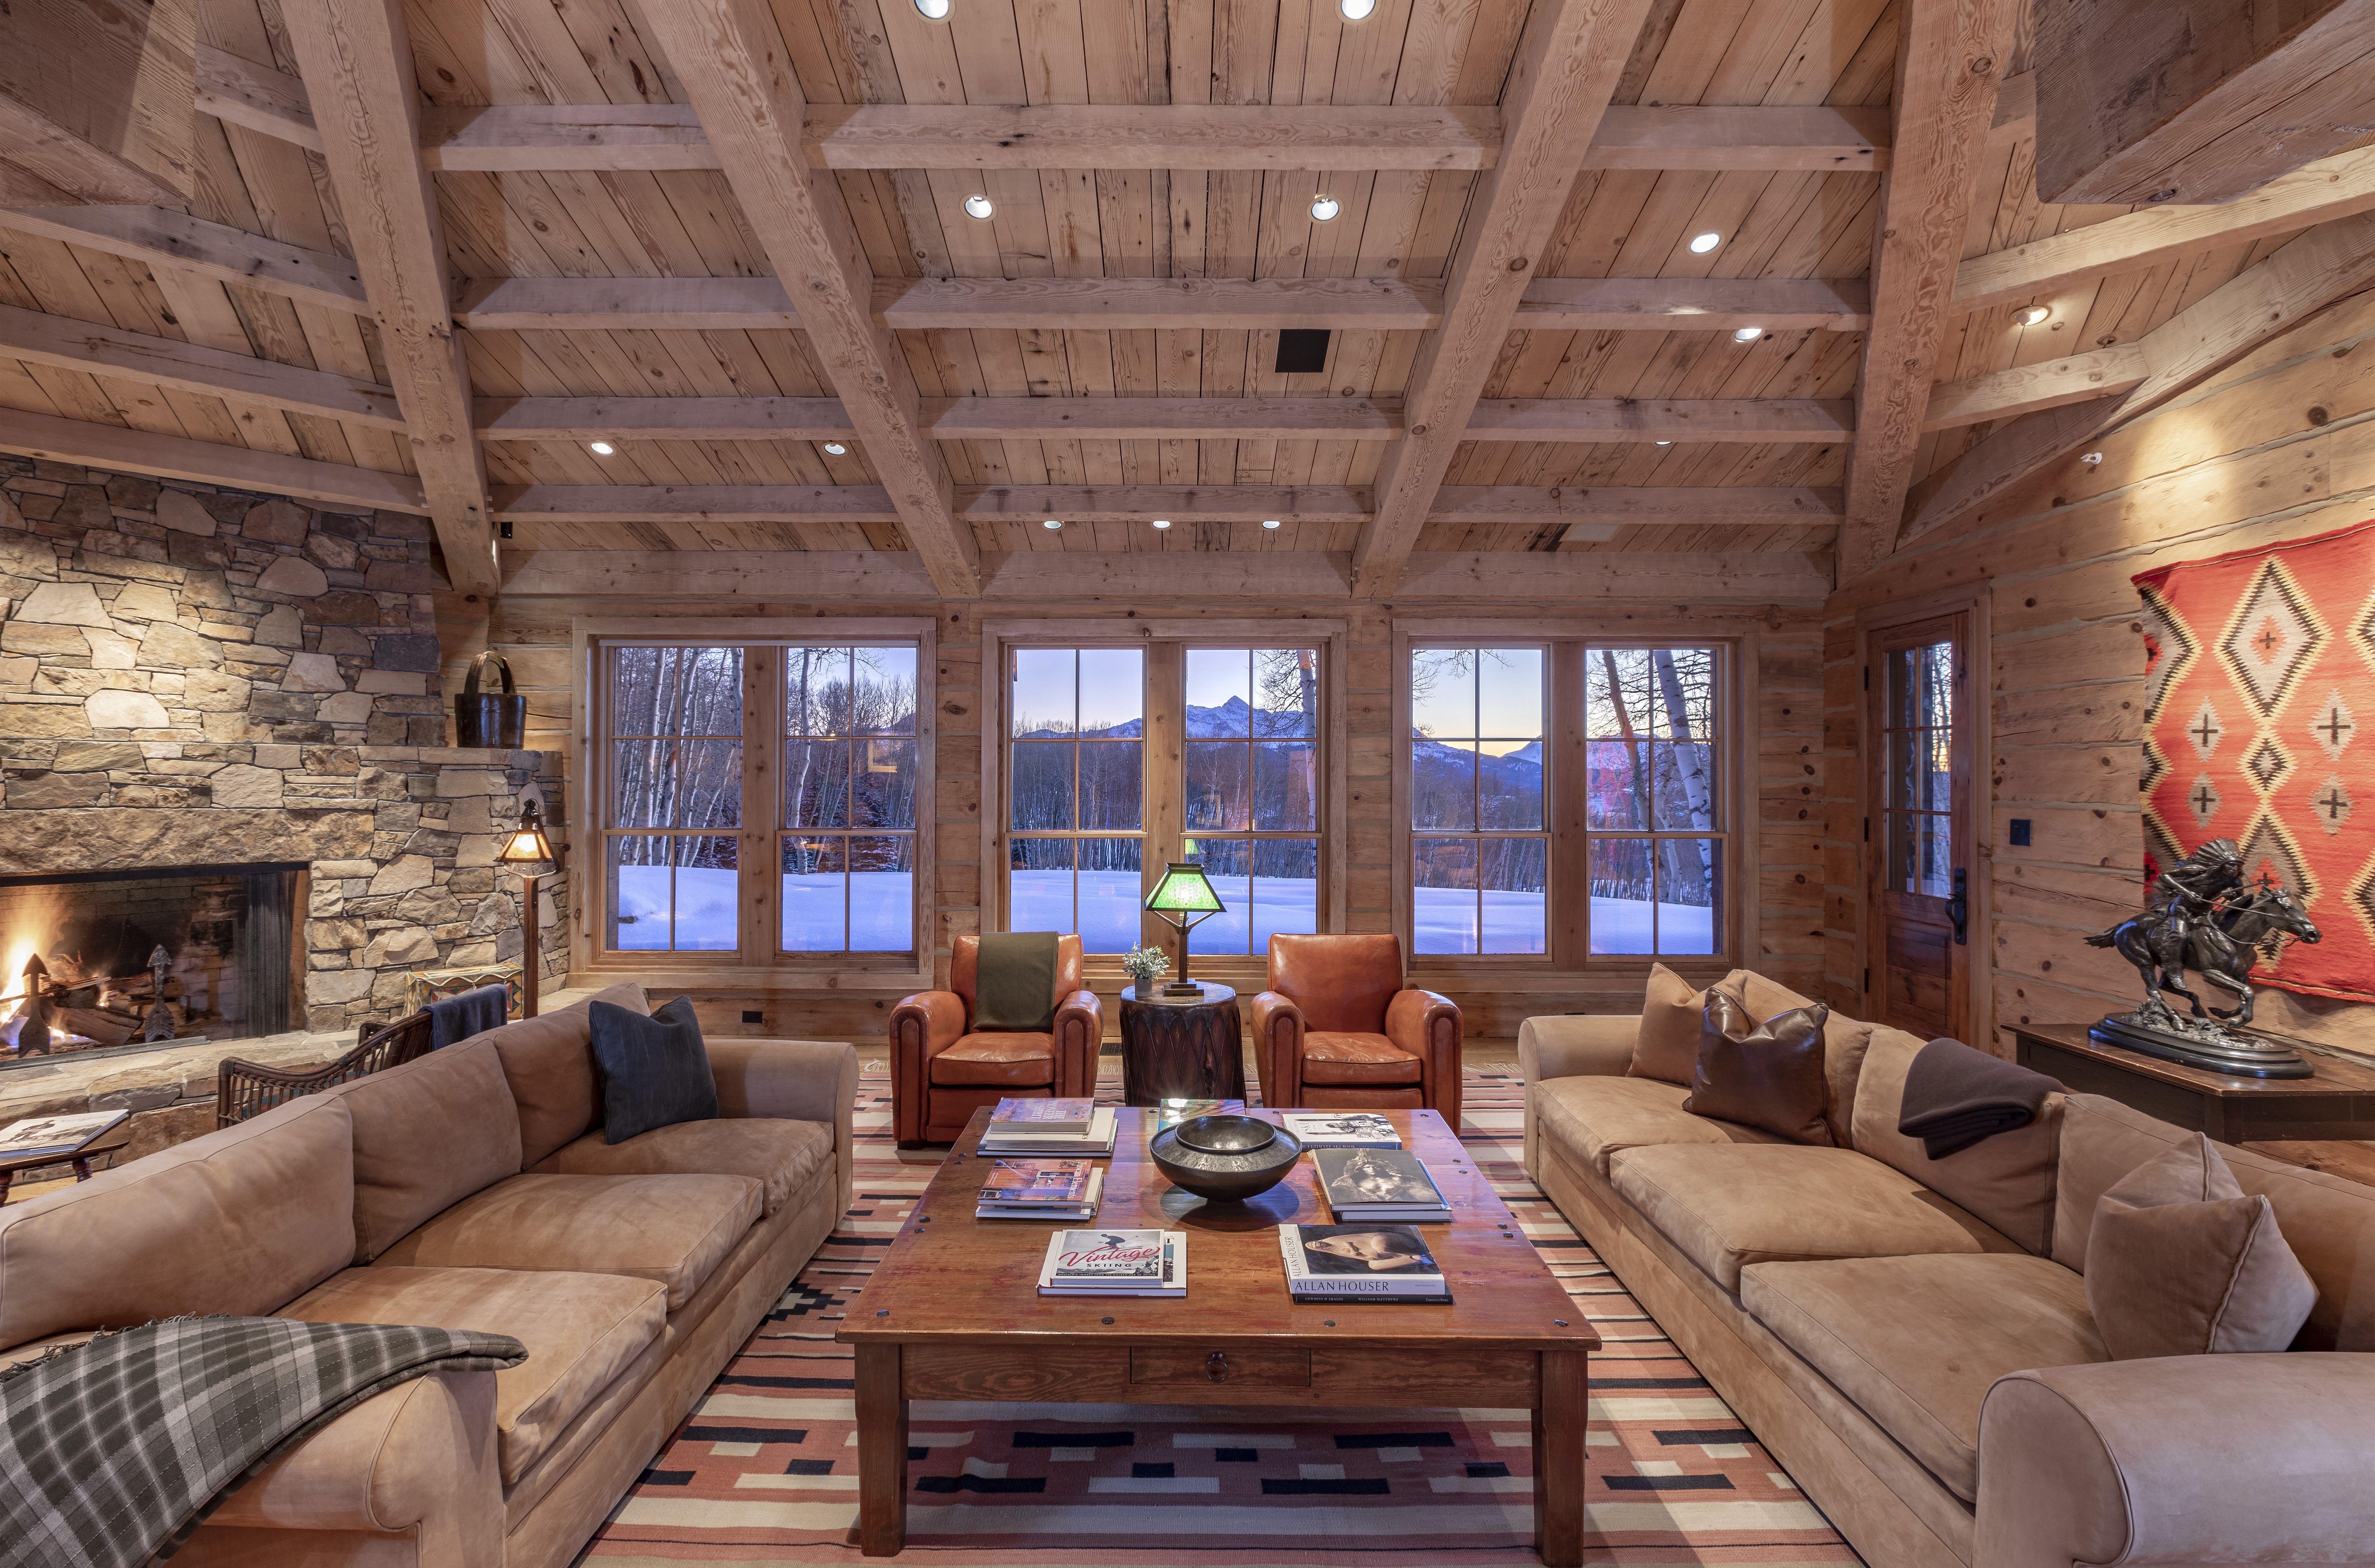 Tom Cruise's Telluride Ranch living room views